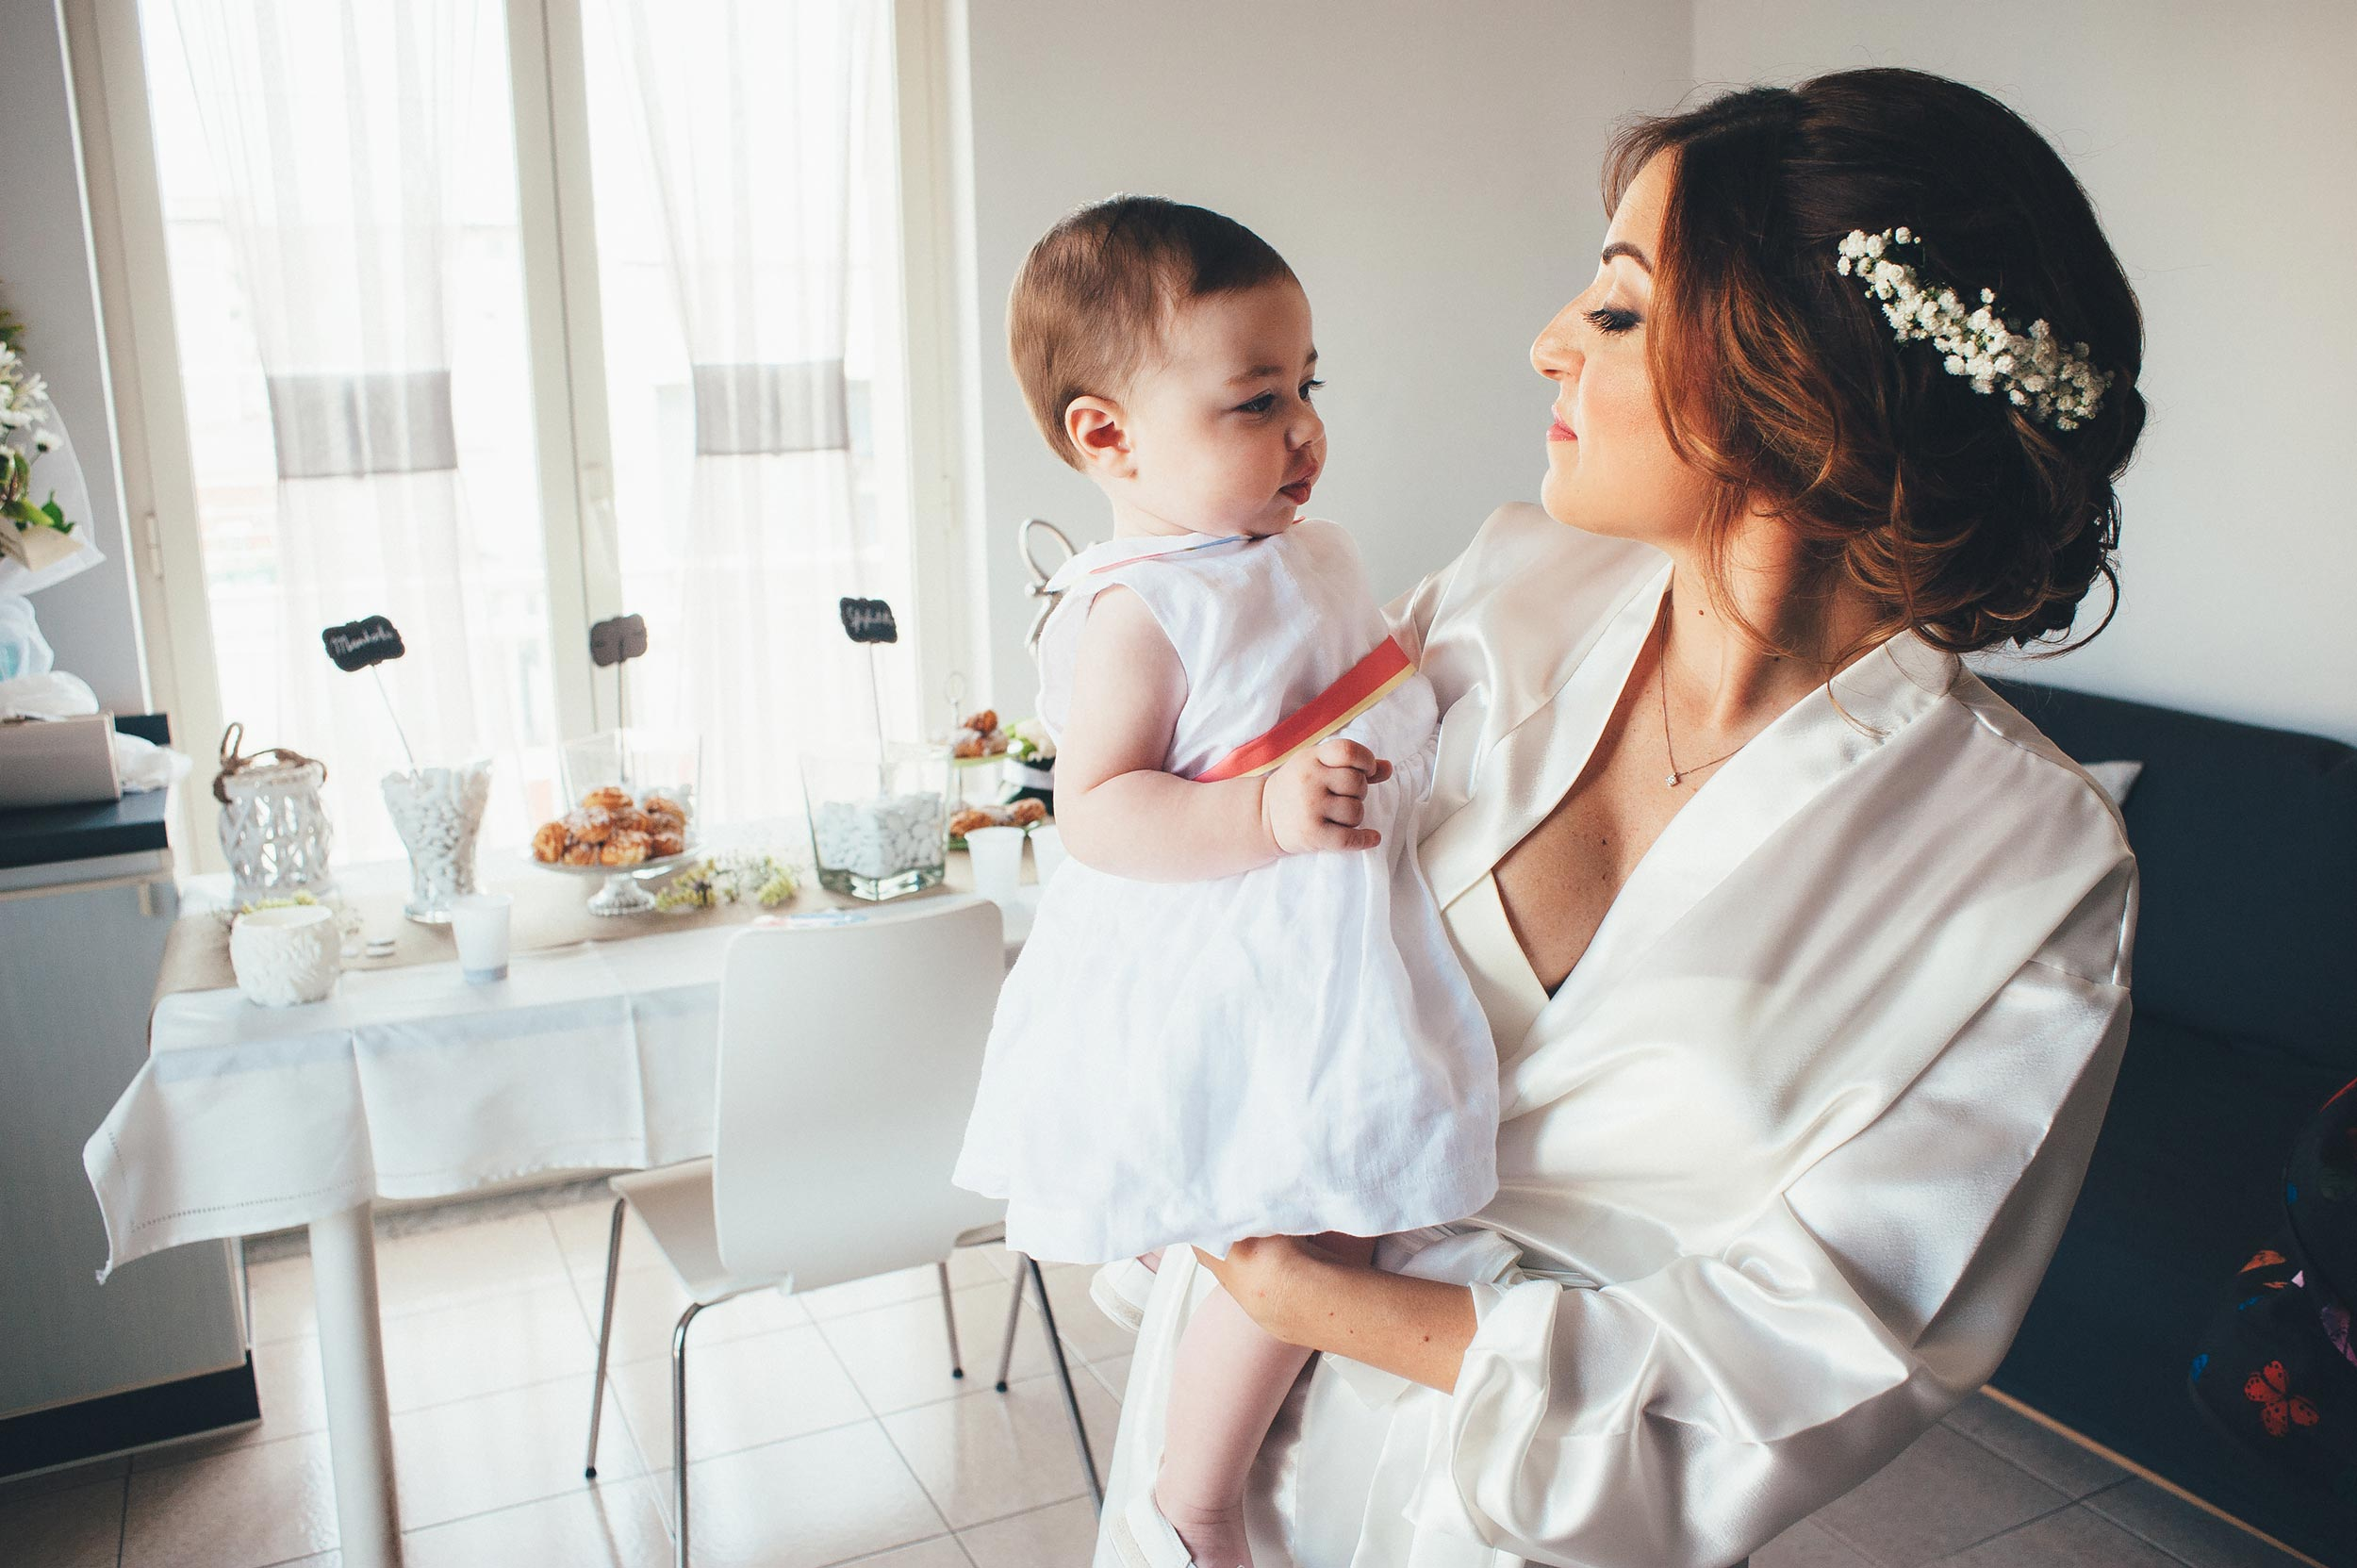 2016-Claudio-Teresa-Naples-Wedding-Photographer-Italy-Alessandro-Avenali-22.jpg